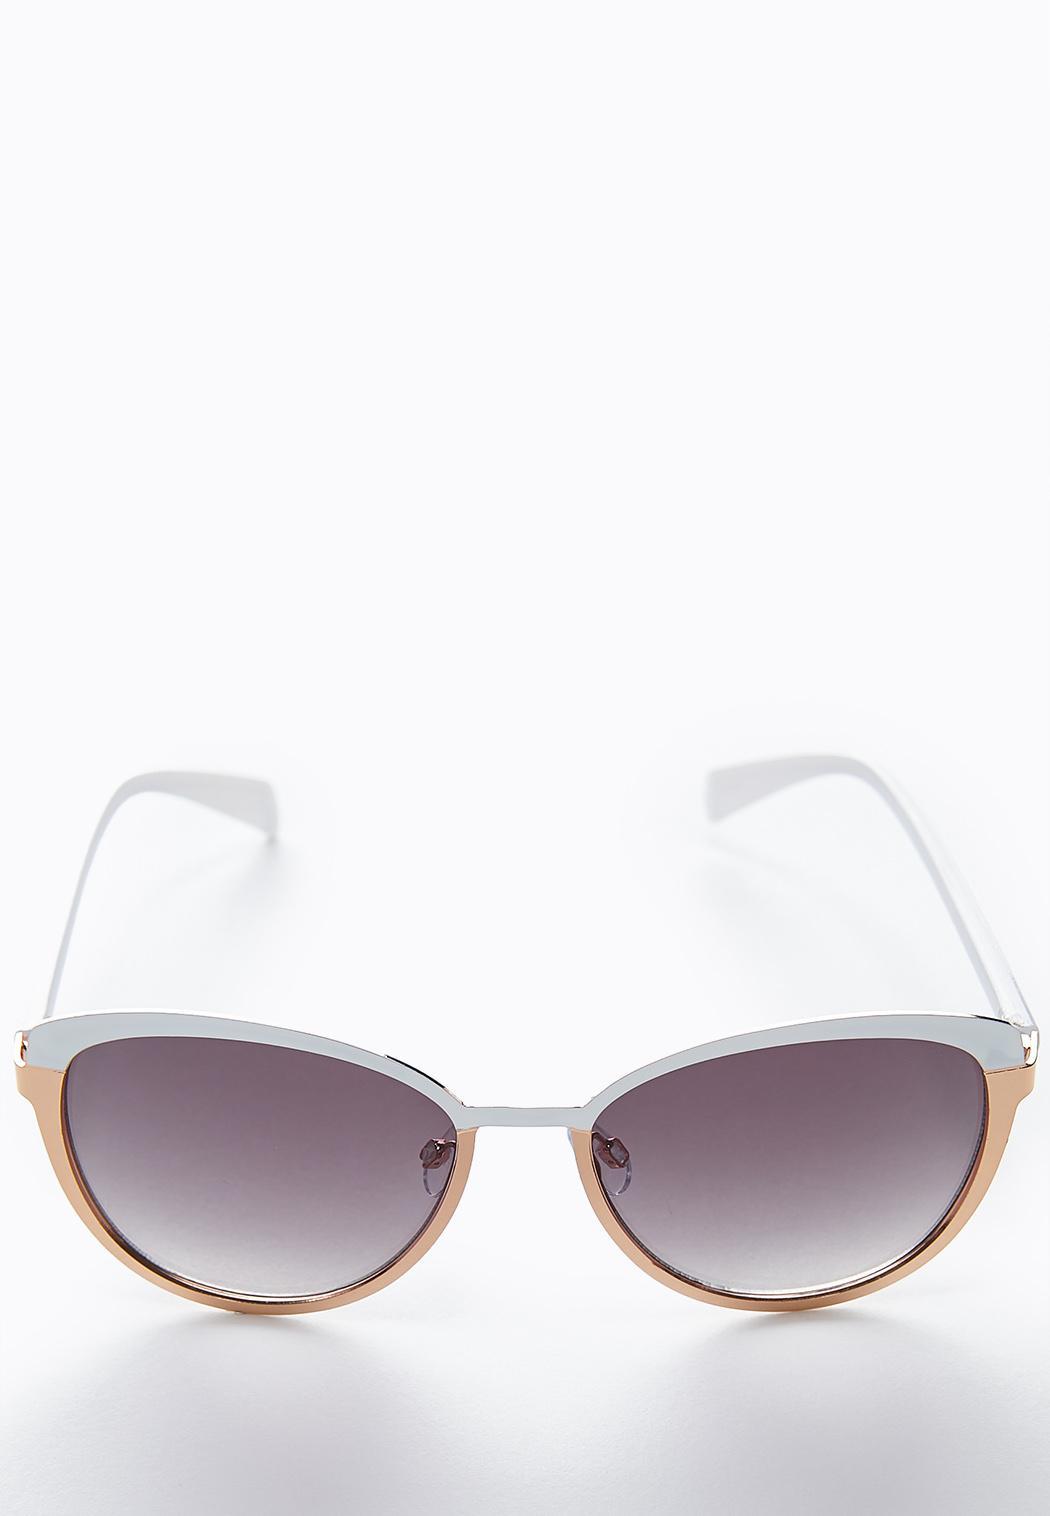 Mixed Metal Cateye Sunglasses